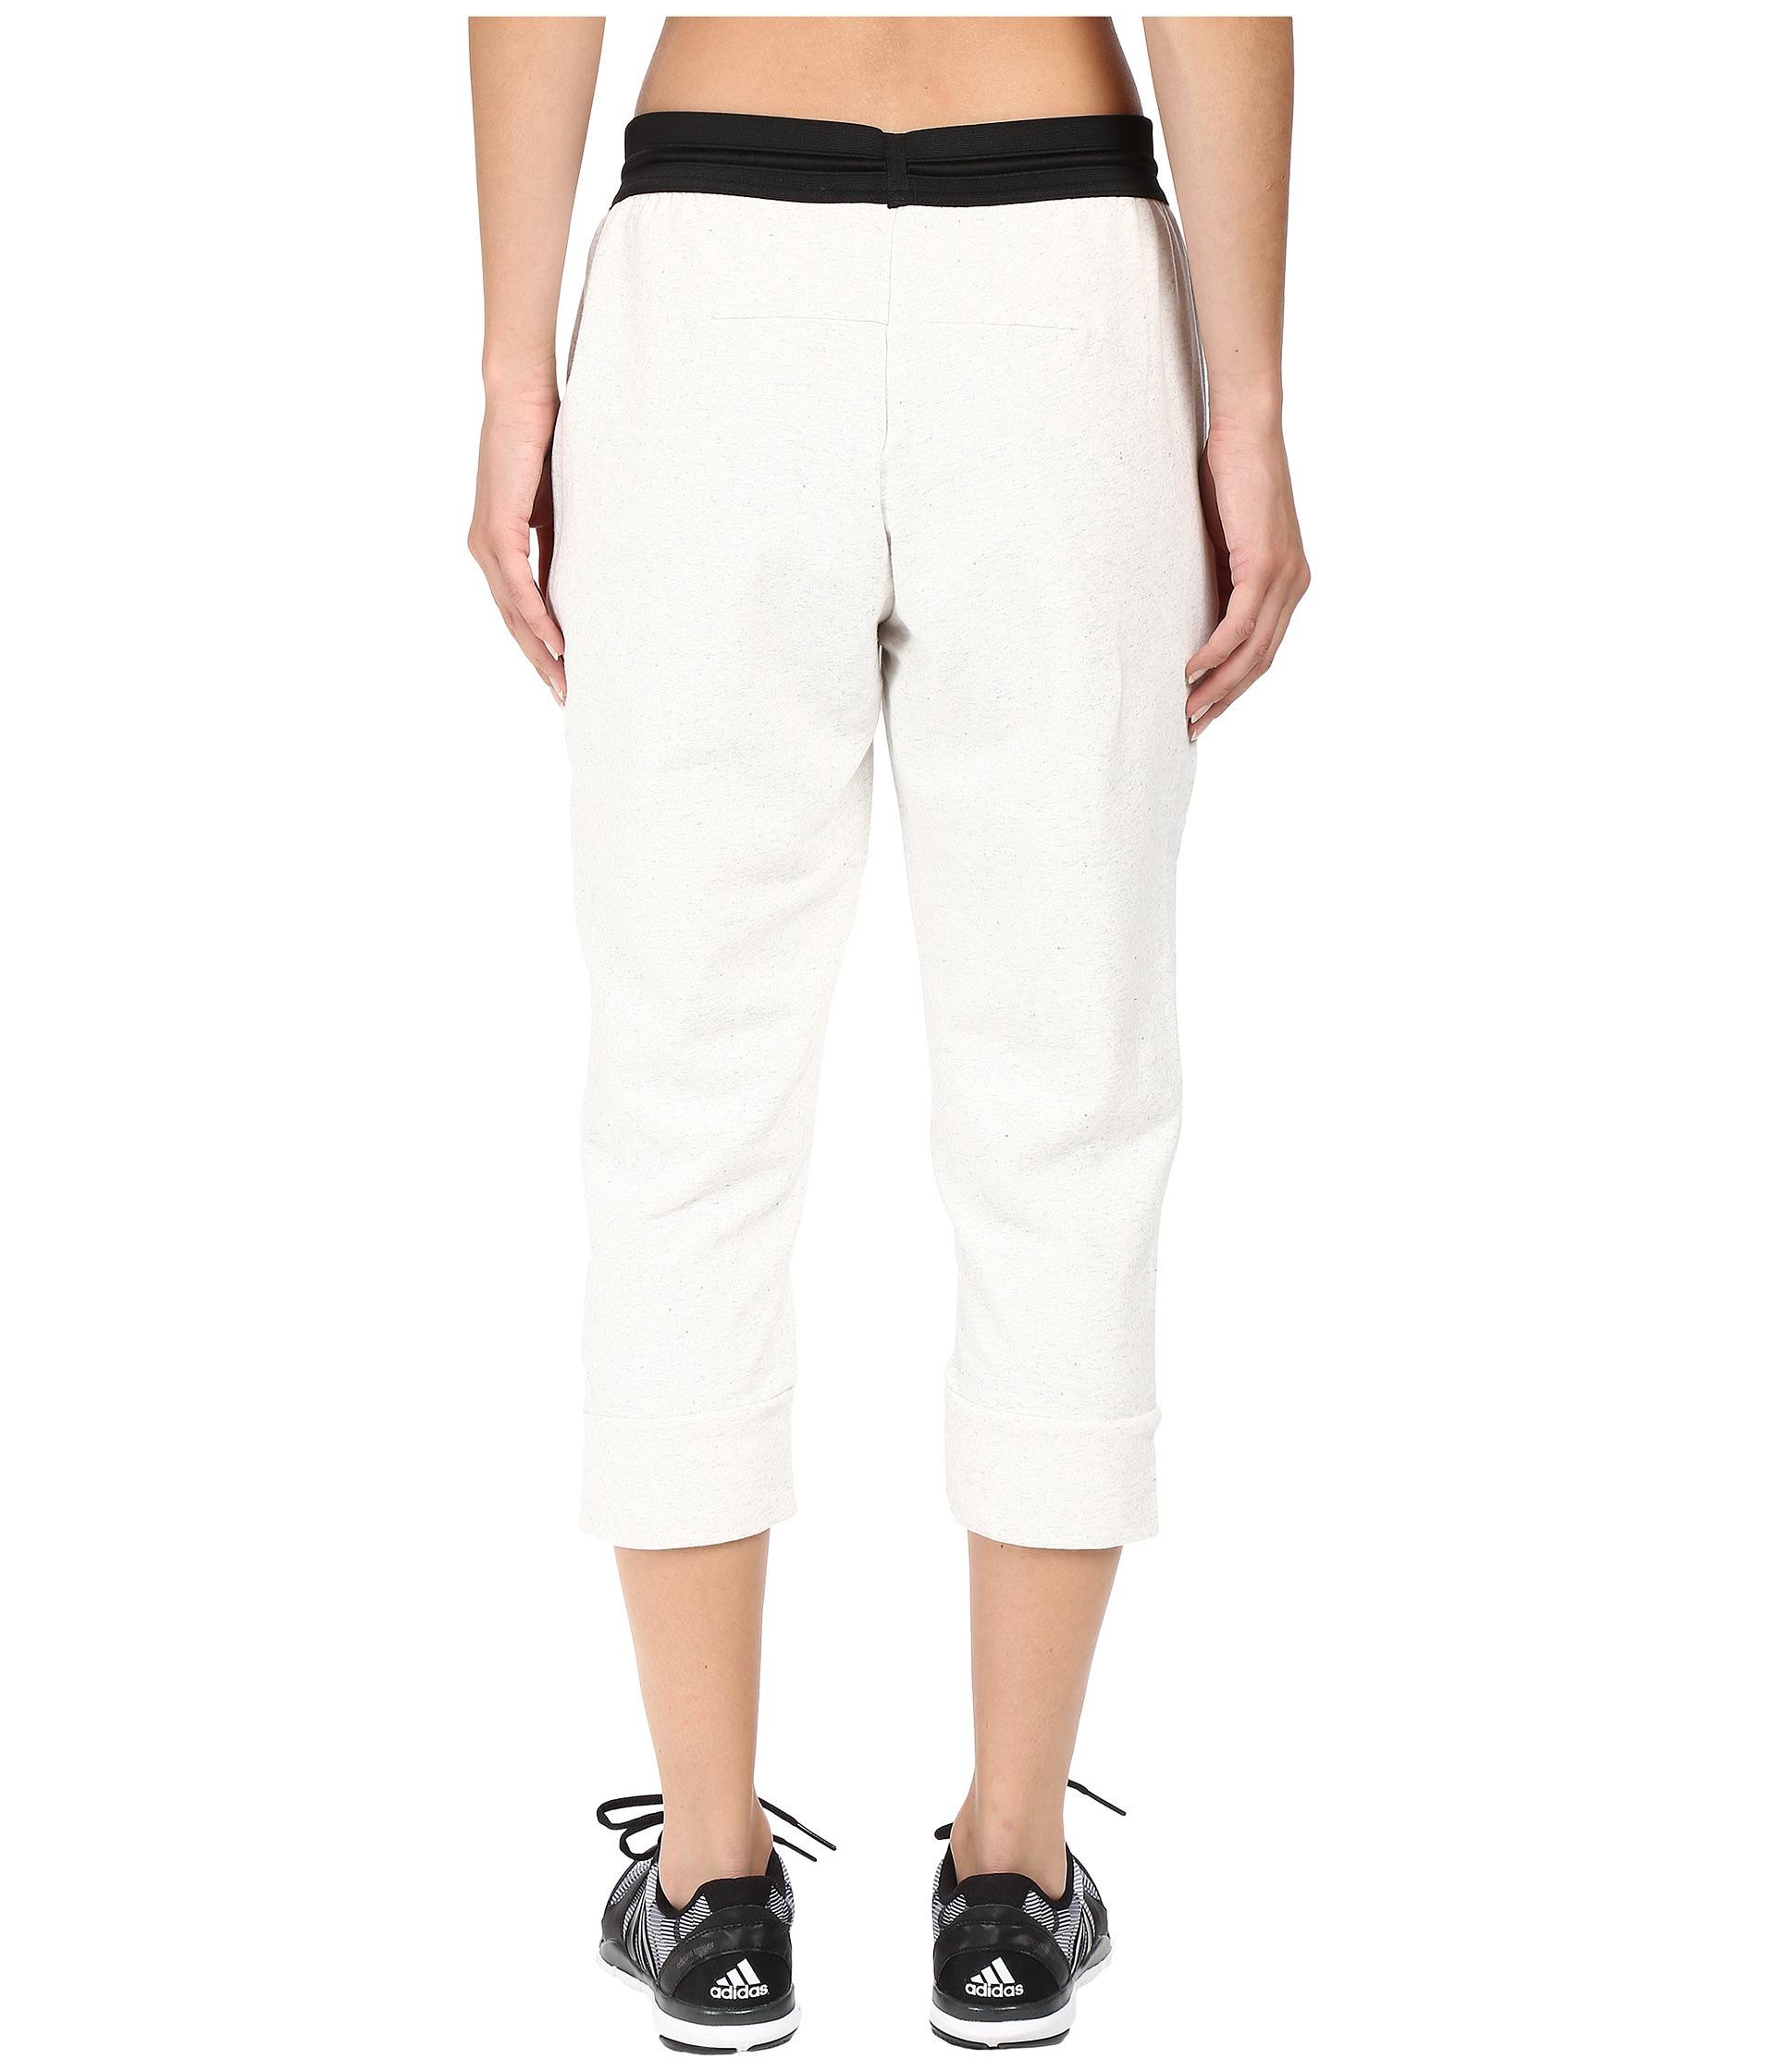 19b7e78b1d9d Lyst - Adidas Originals Cotton Fleece 3 4 Pants in White